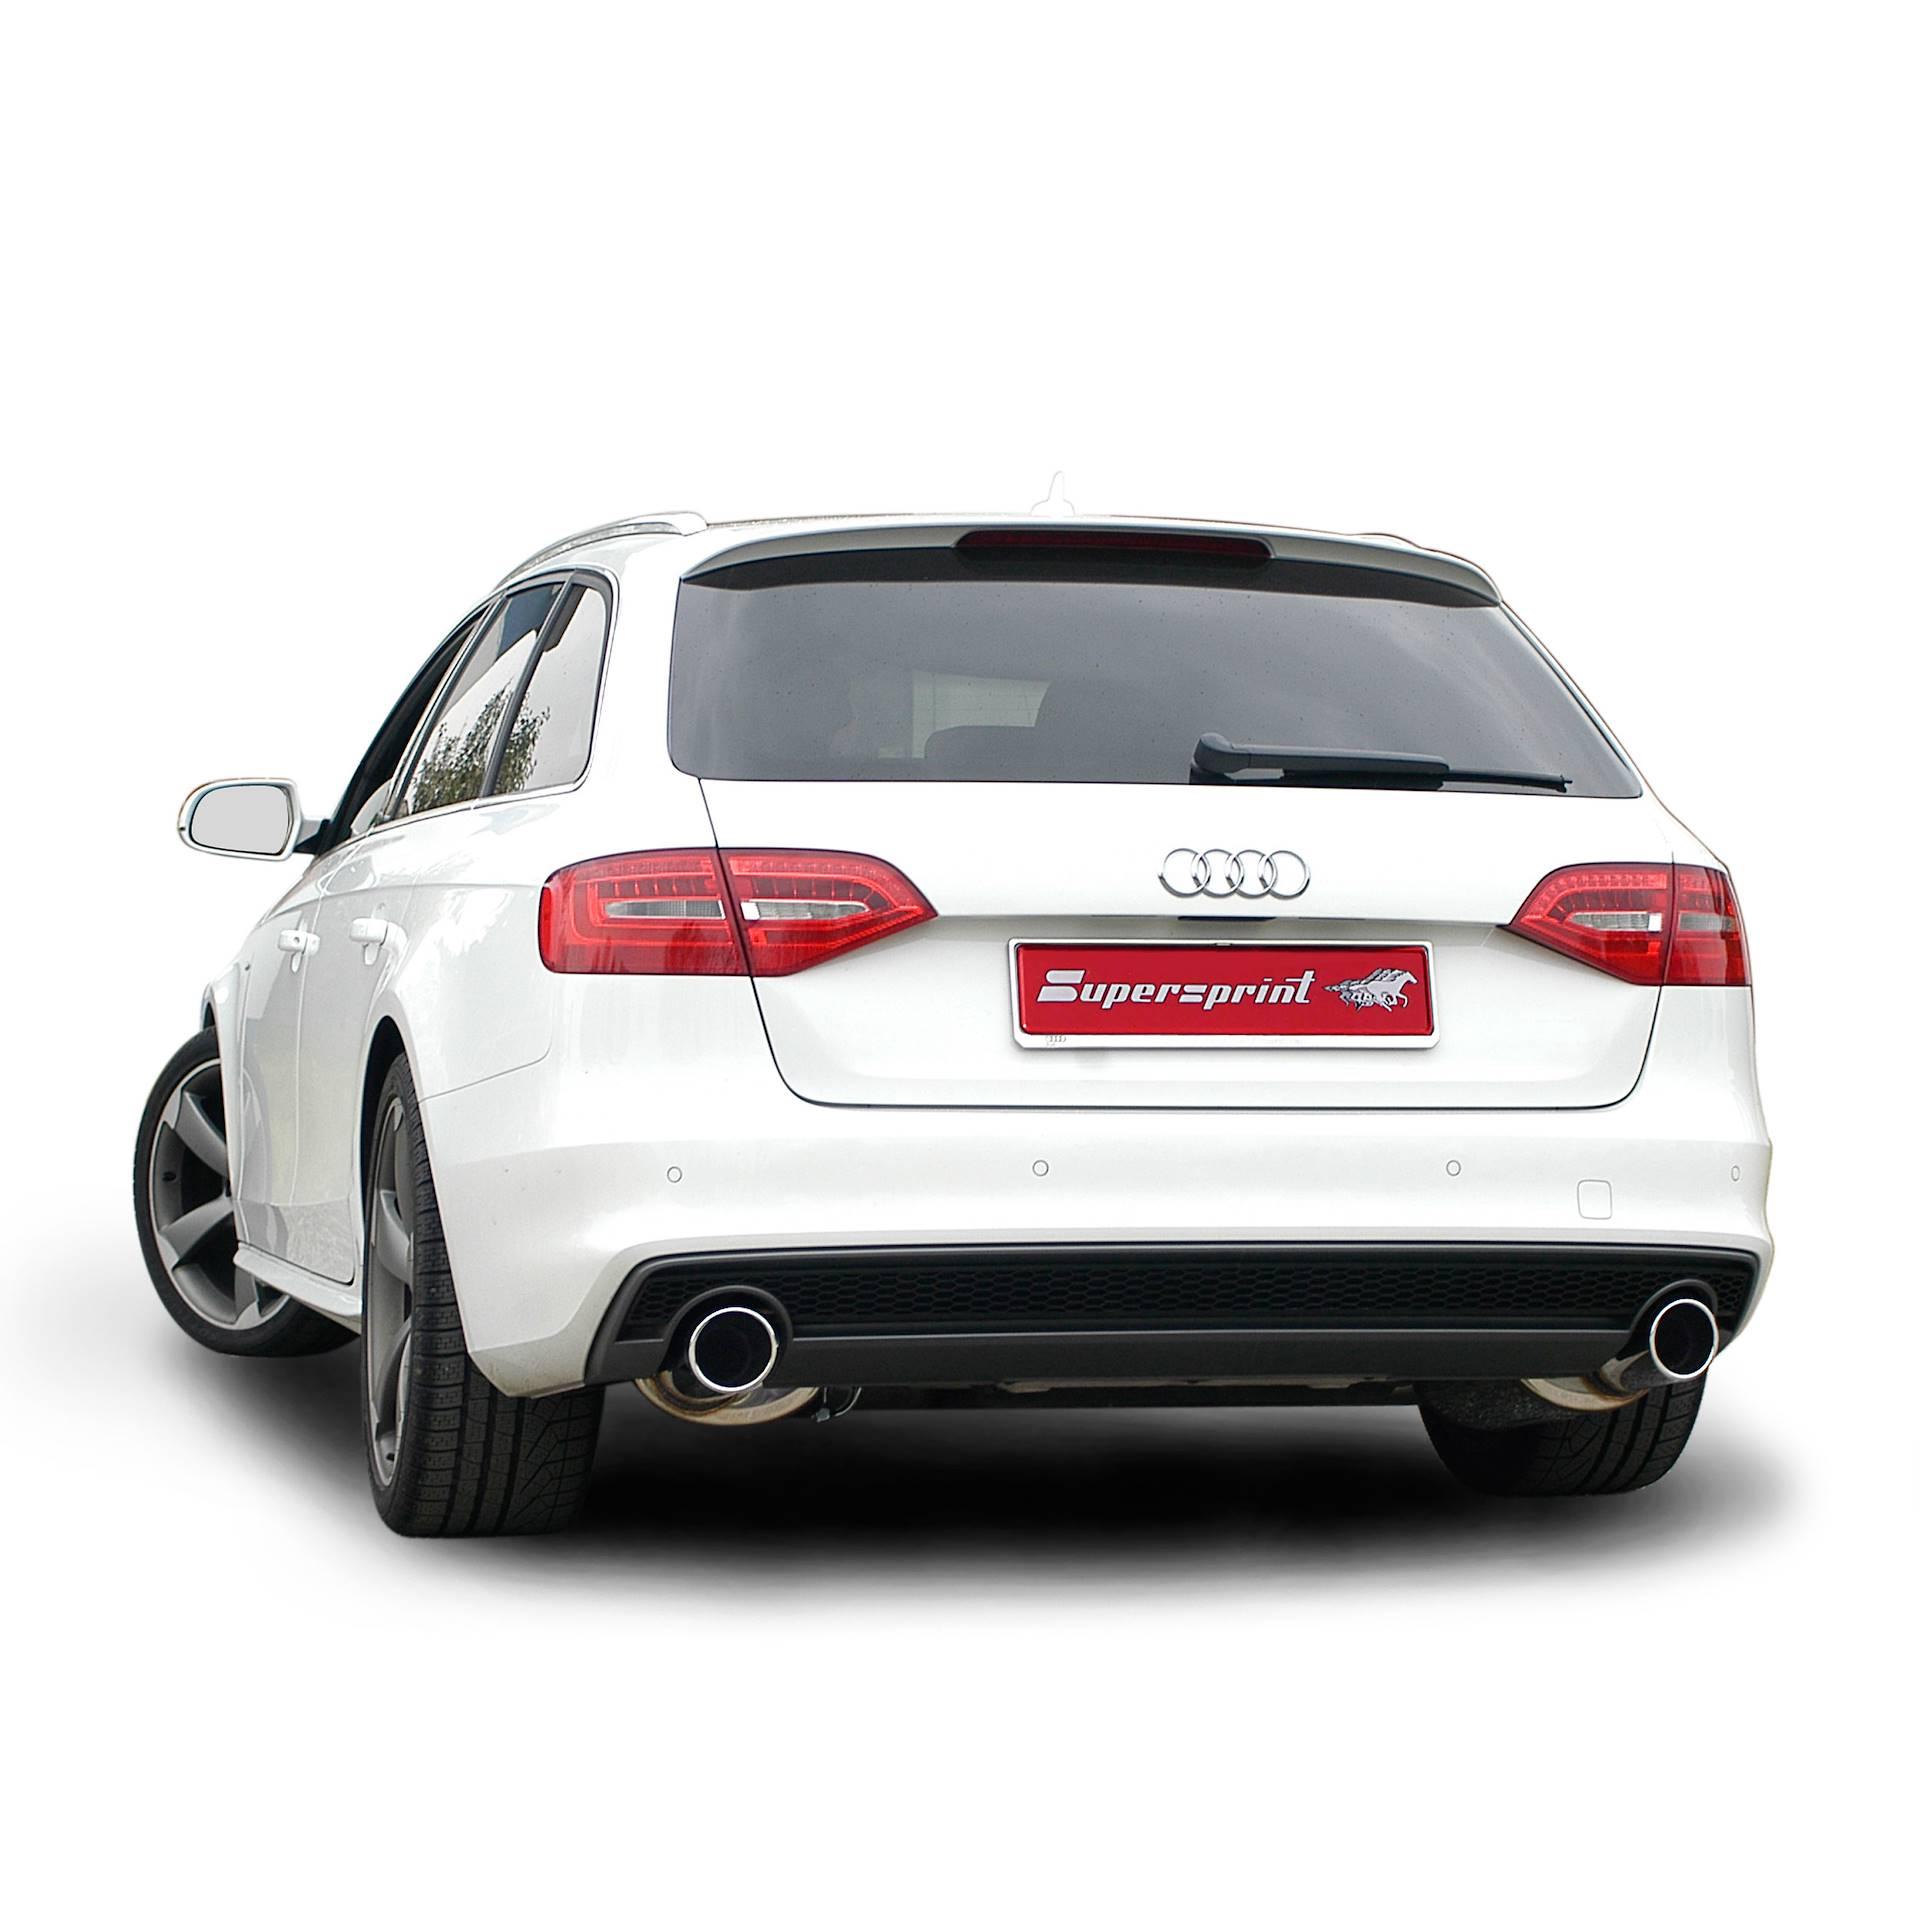 Audi A4 B8 Quattro Limousine Avant 2 0 Tdi 143 170